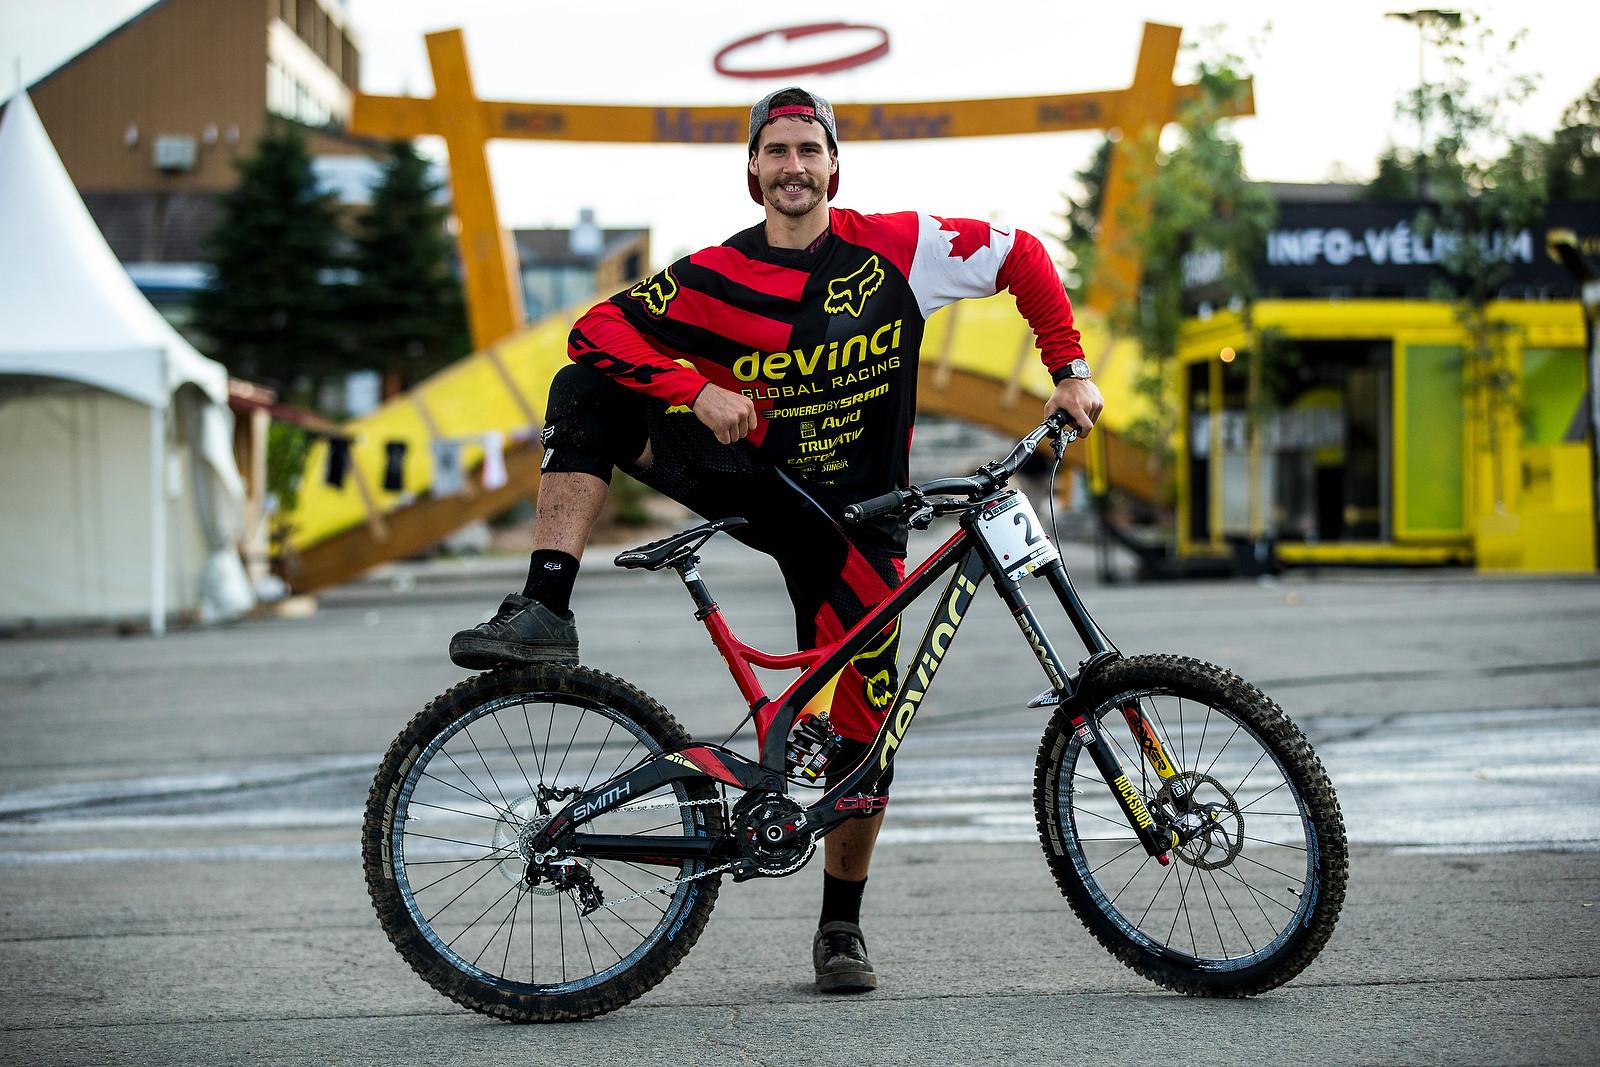 WINNING BIKE: Steve Smith's Devinci Wilson Carbon - WINNING BIKE: Steve Smith's Devinci Wilson Carbon - Mountain Biking Pictures - Vital MTB